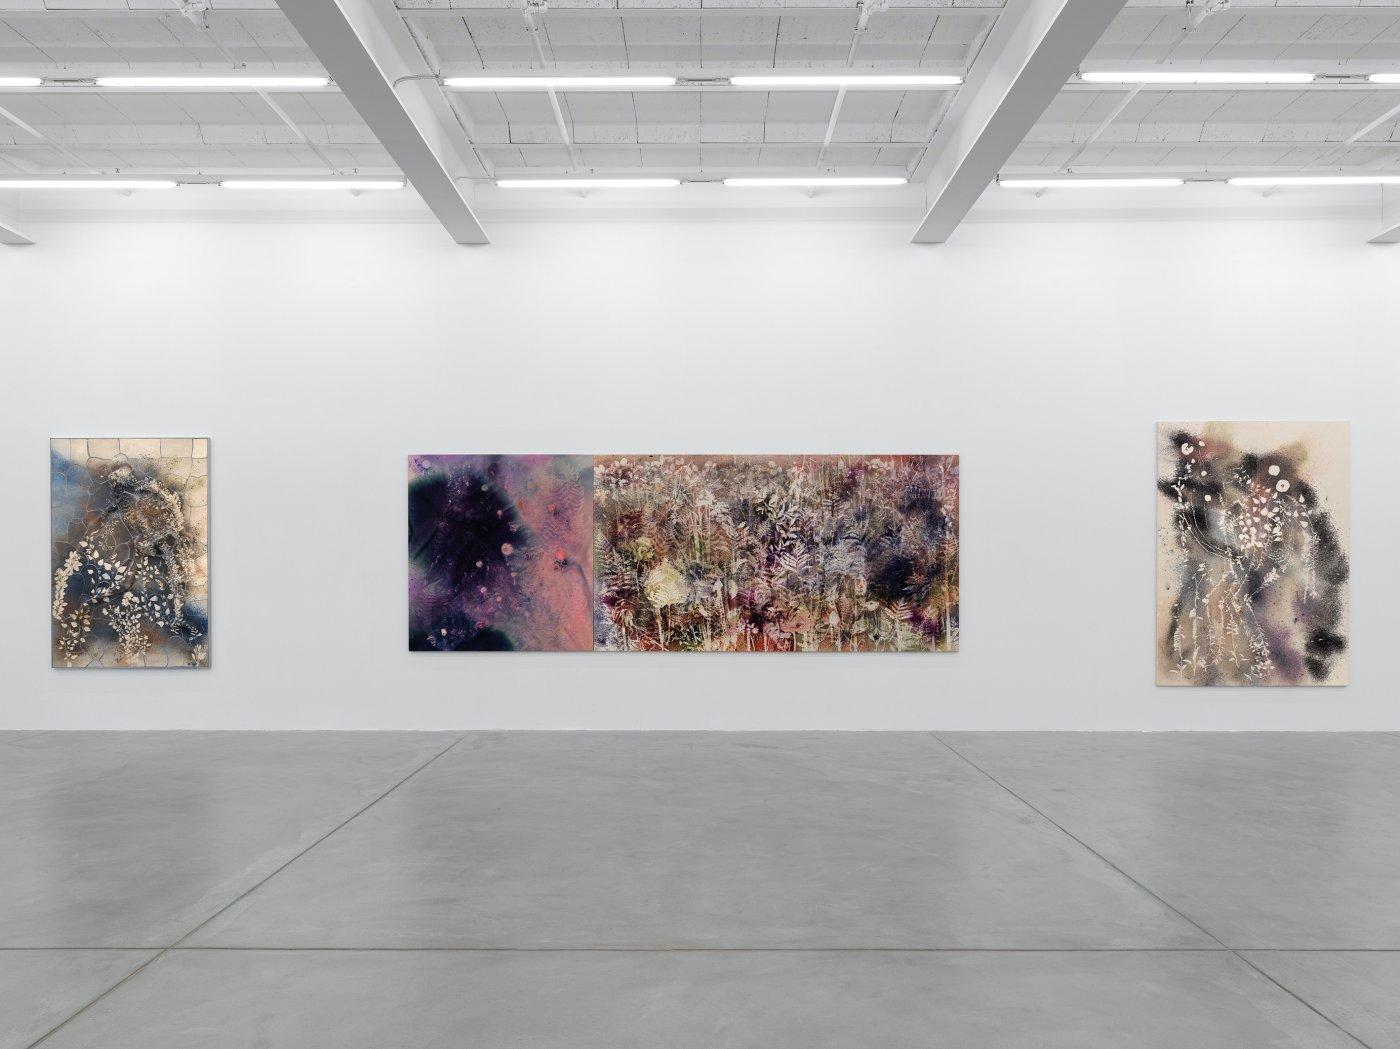 Galerie Eva Presenhuber Maag Areal Sam Falls 2